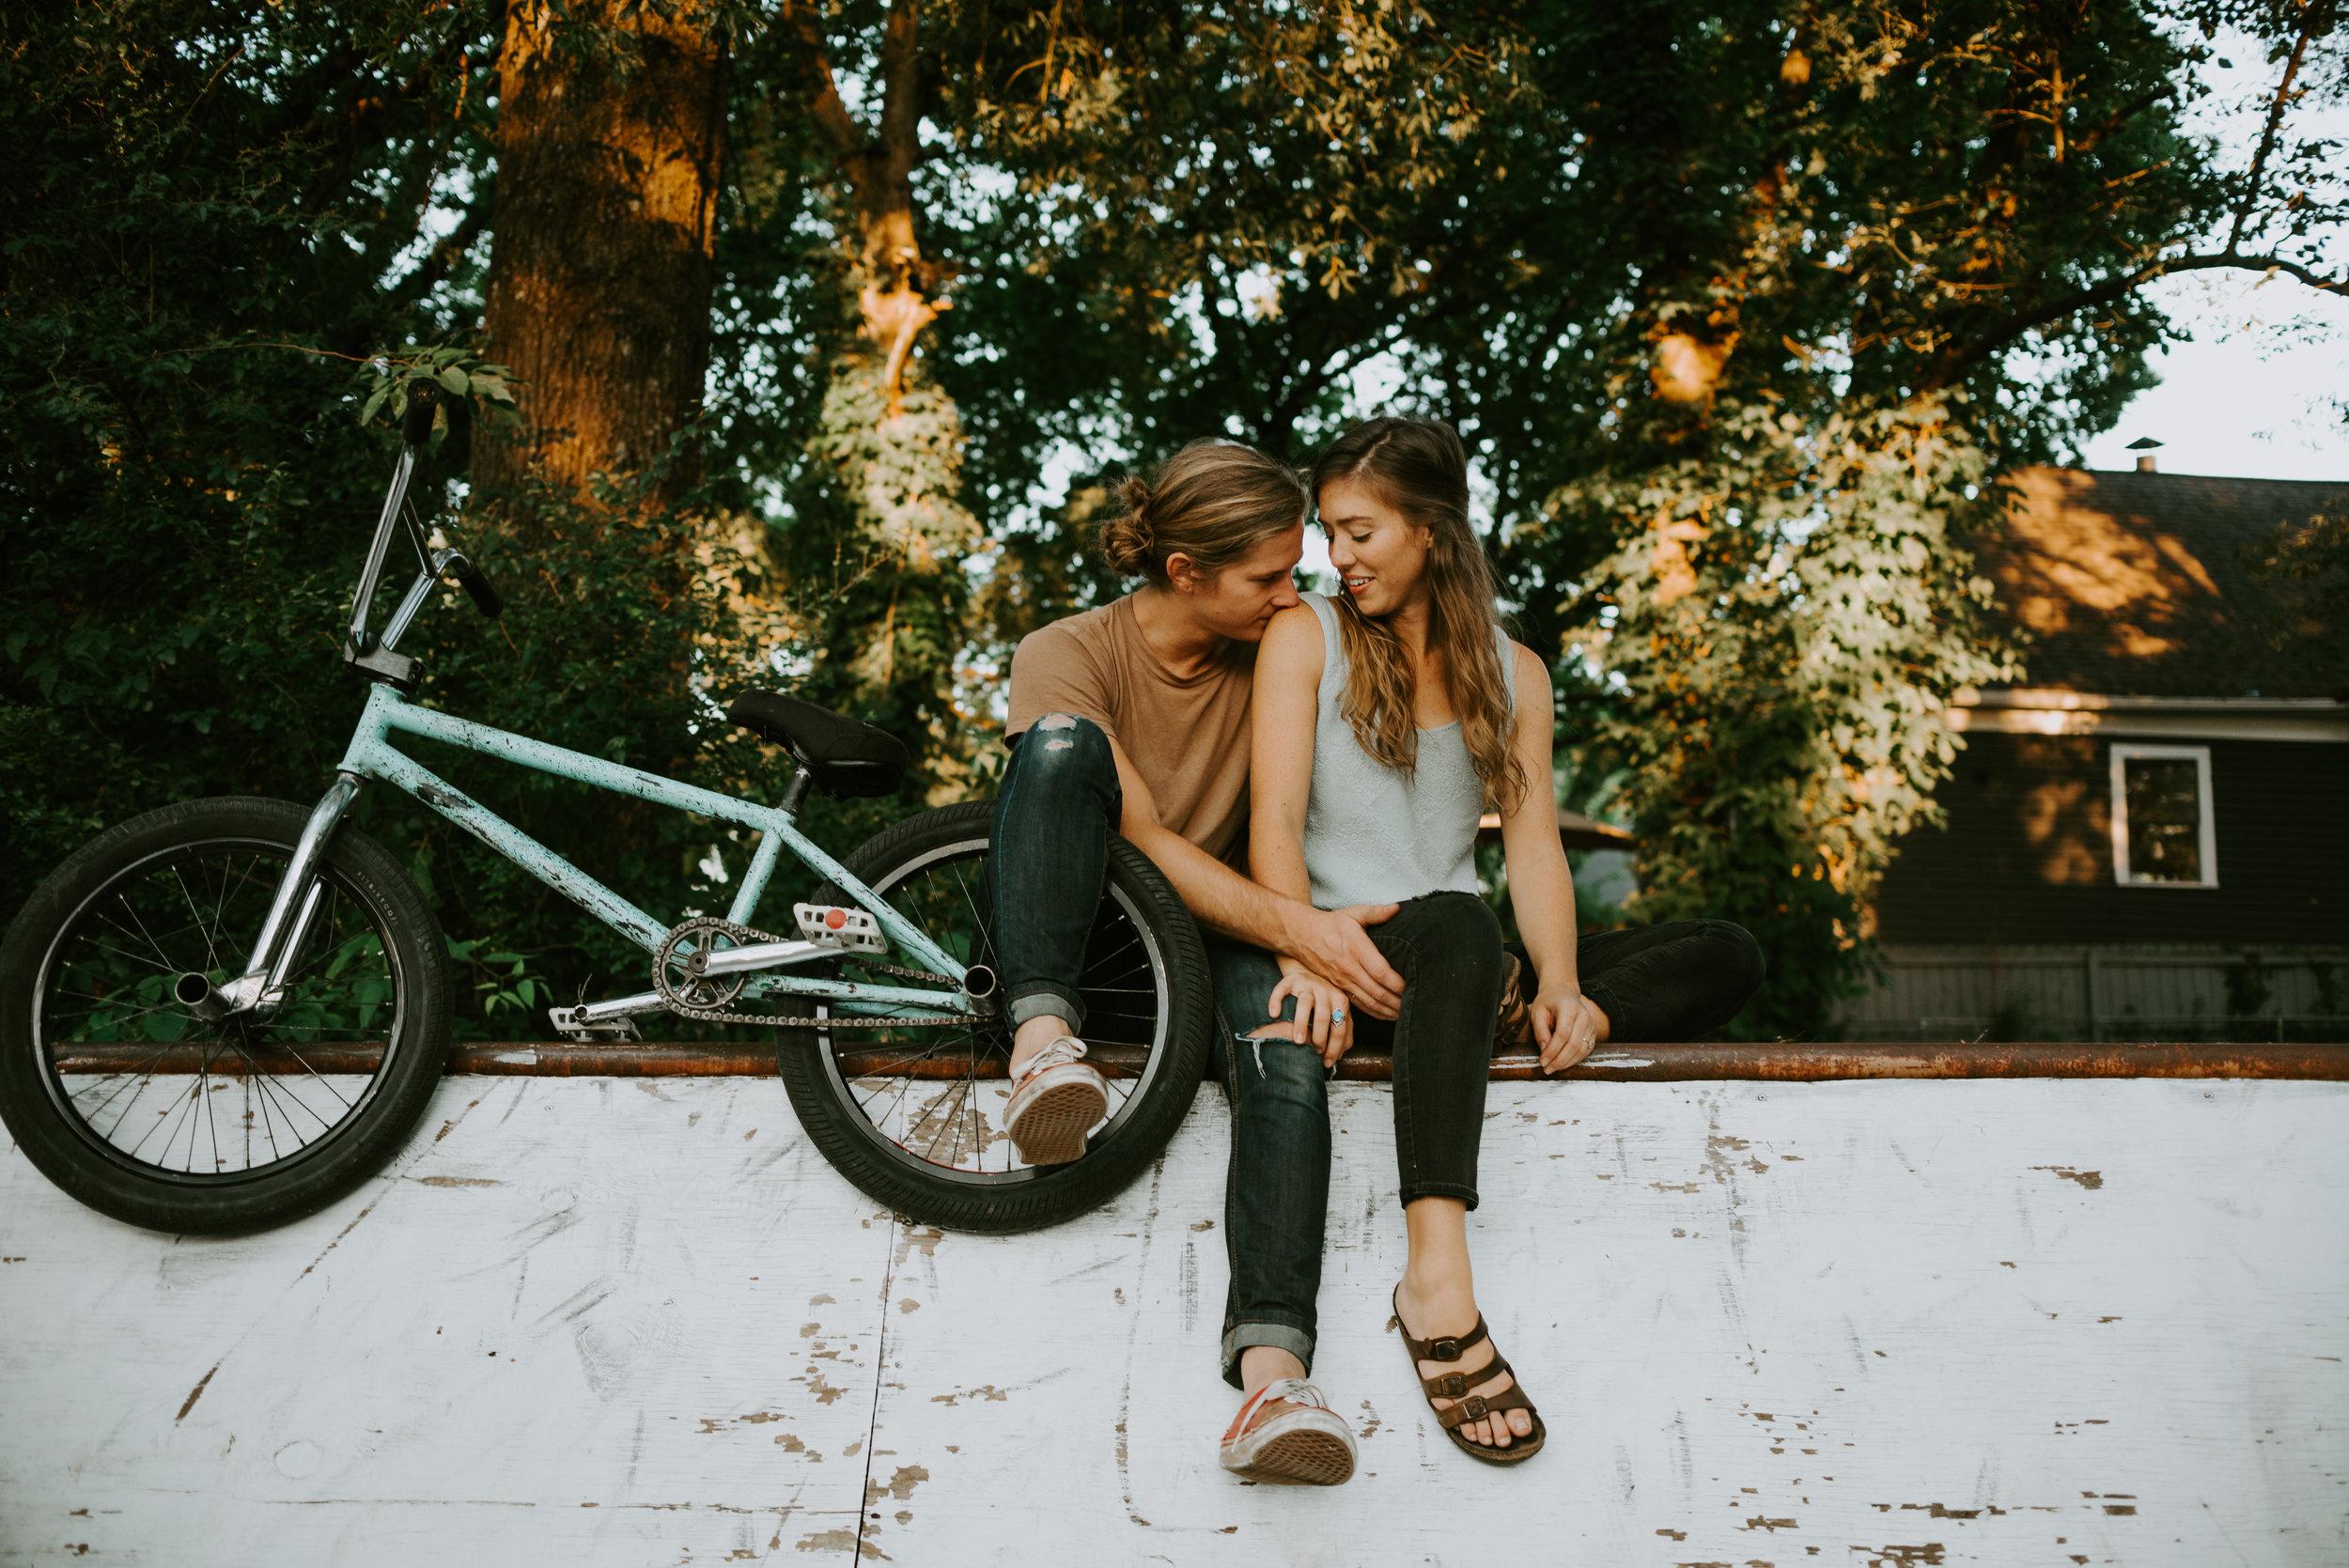 WonderlyCreative_Couples_7.9.18_Cameron&Alexis_-200.jpg